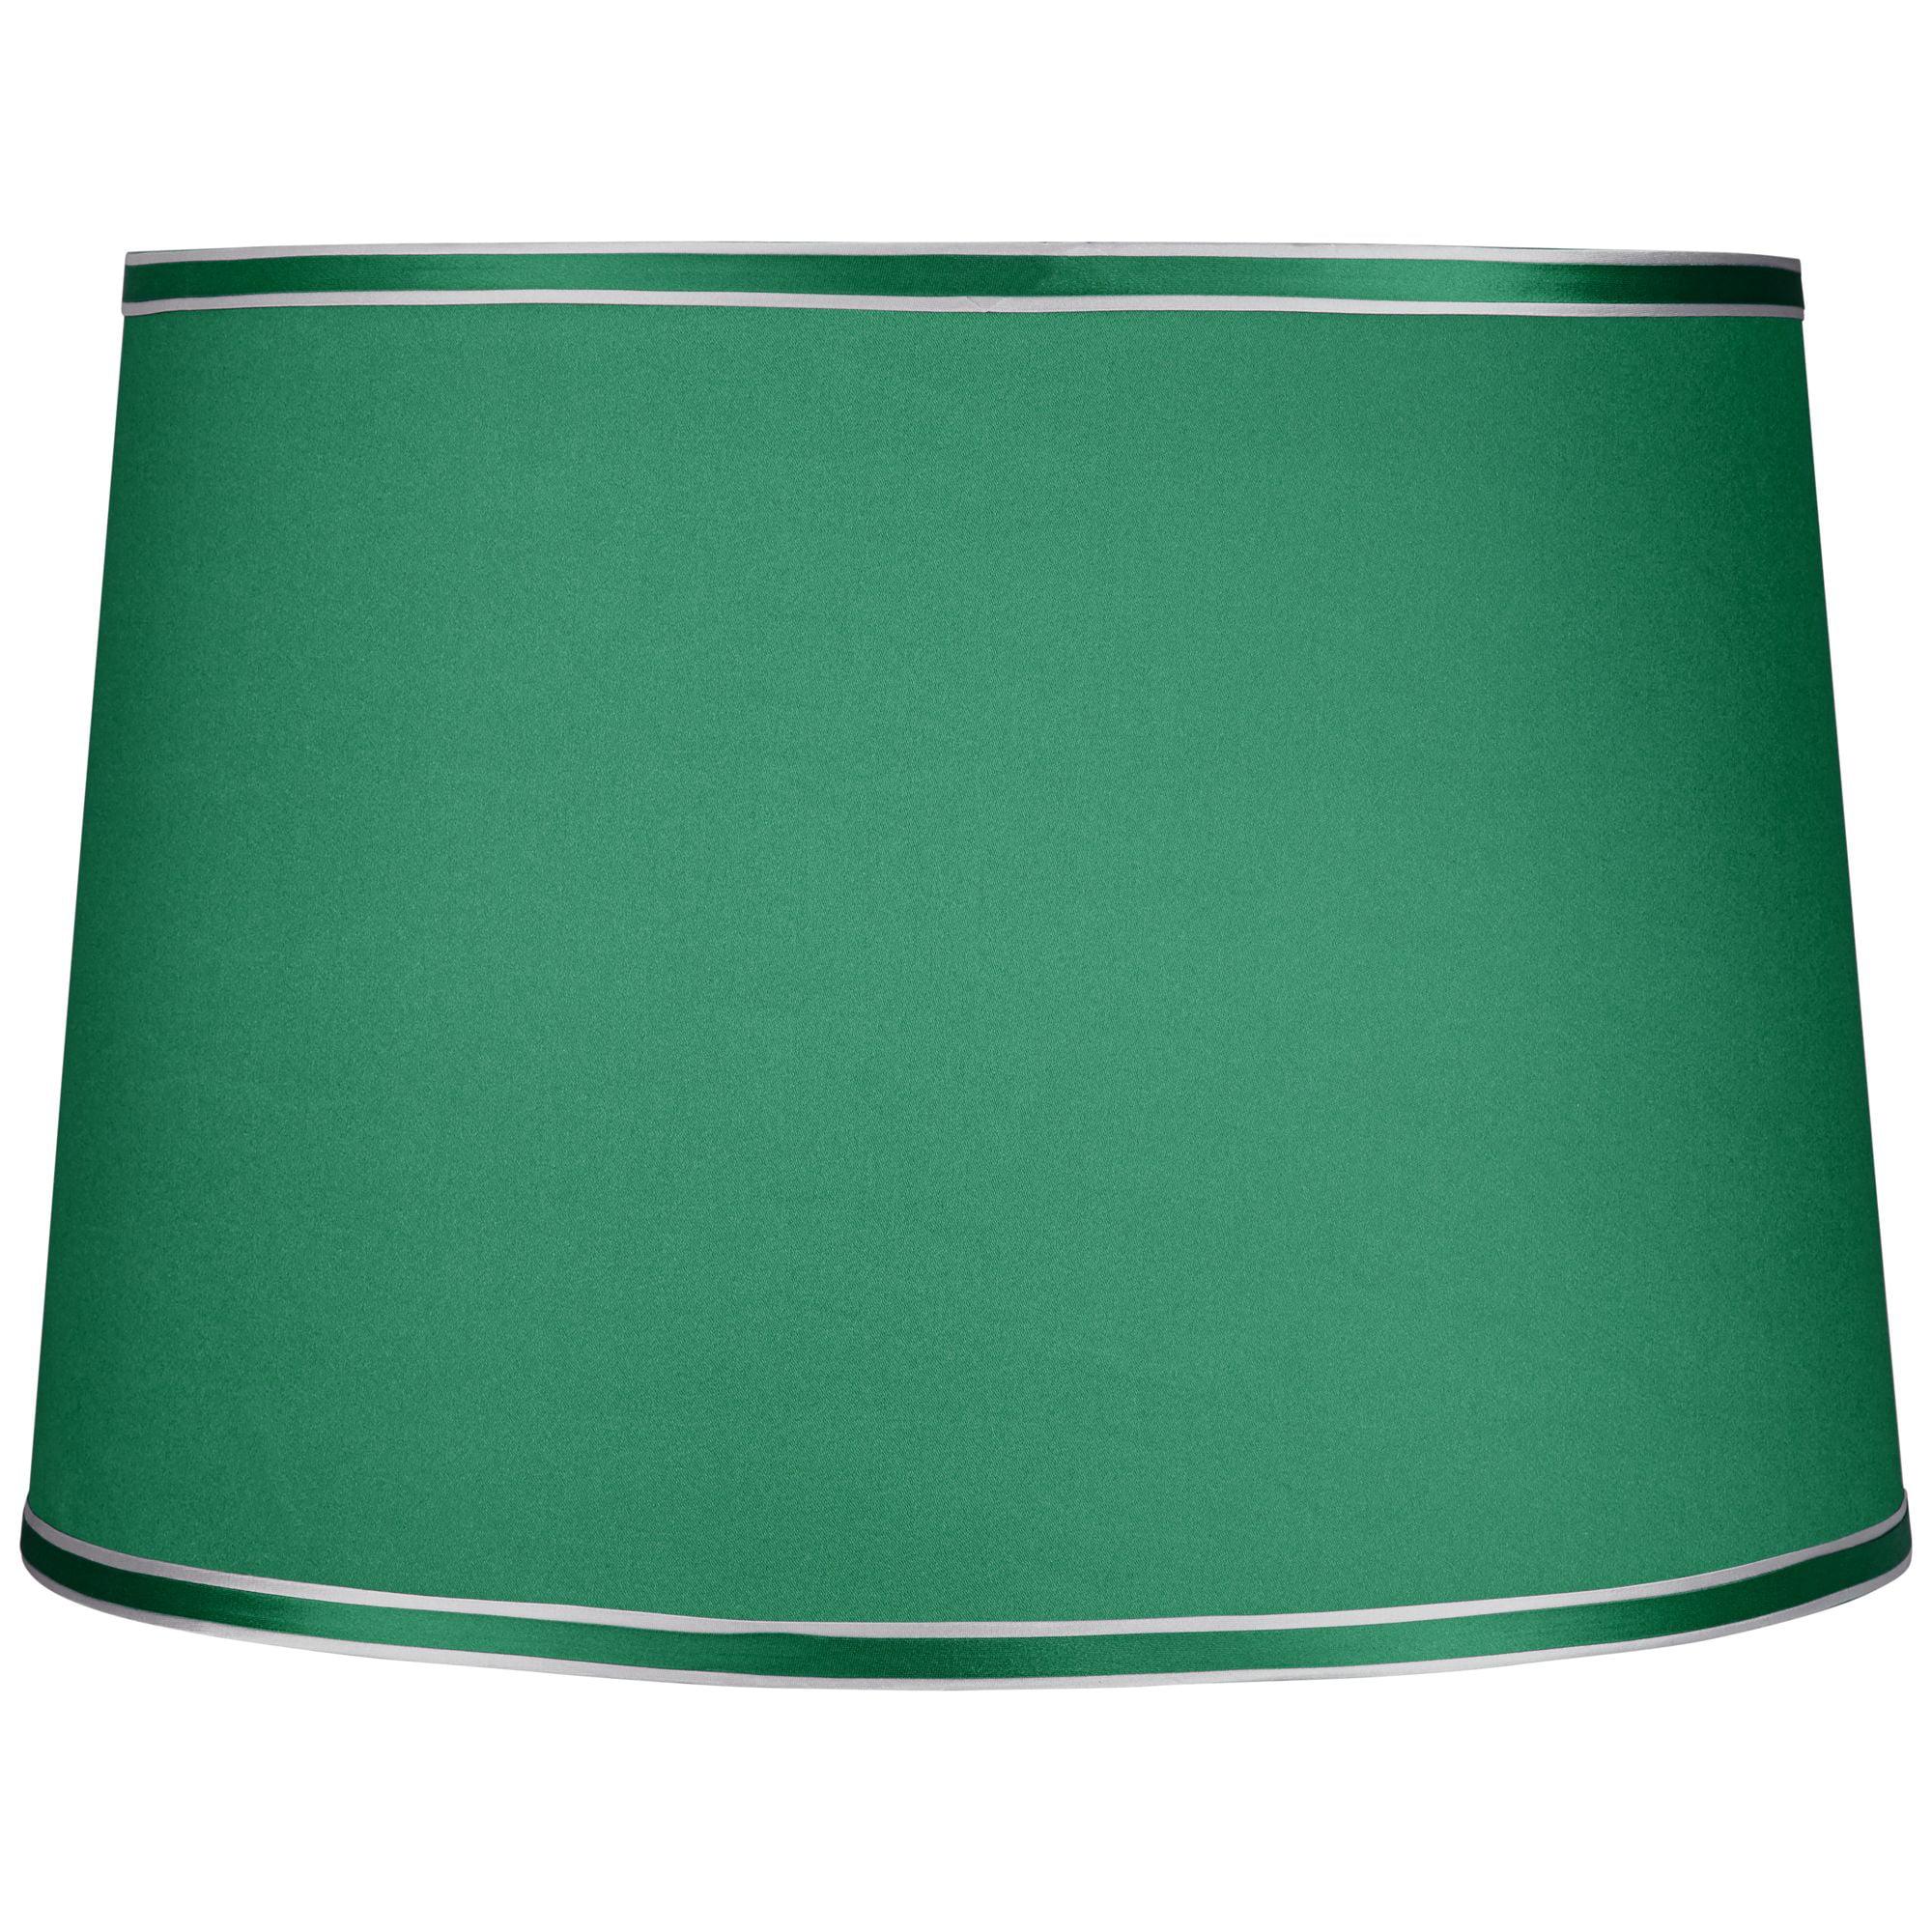 Brentwood Emerald Green Hardback Lamp Shade 14x16x11 (Spider)